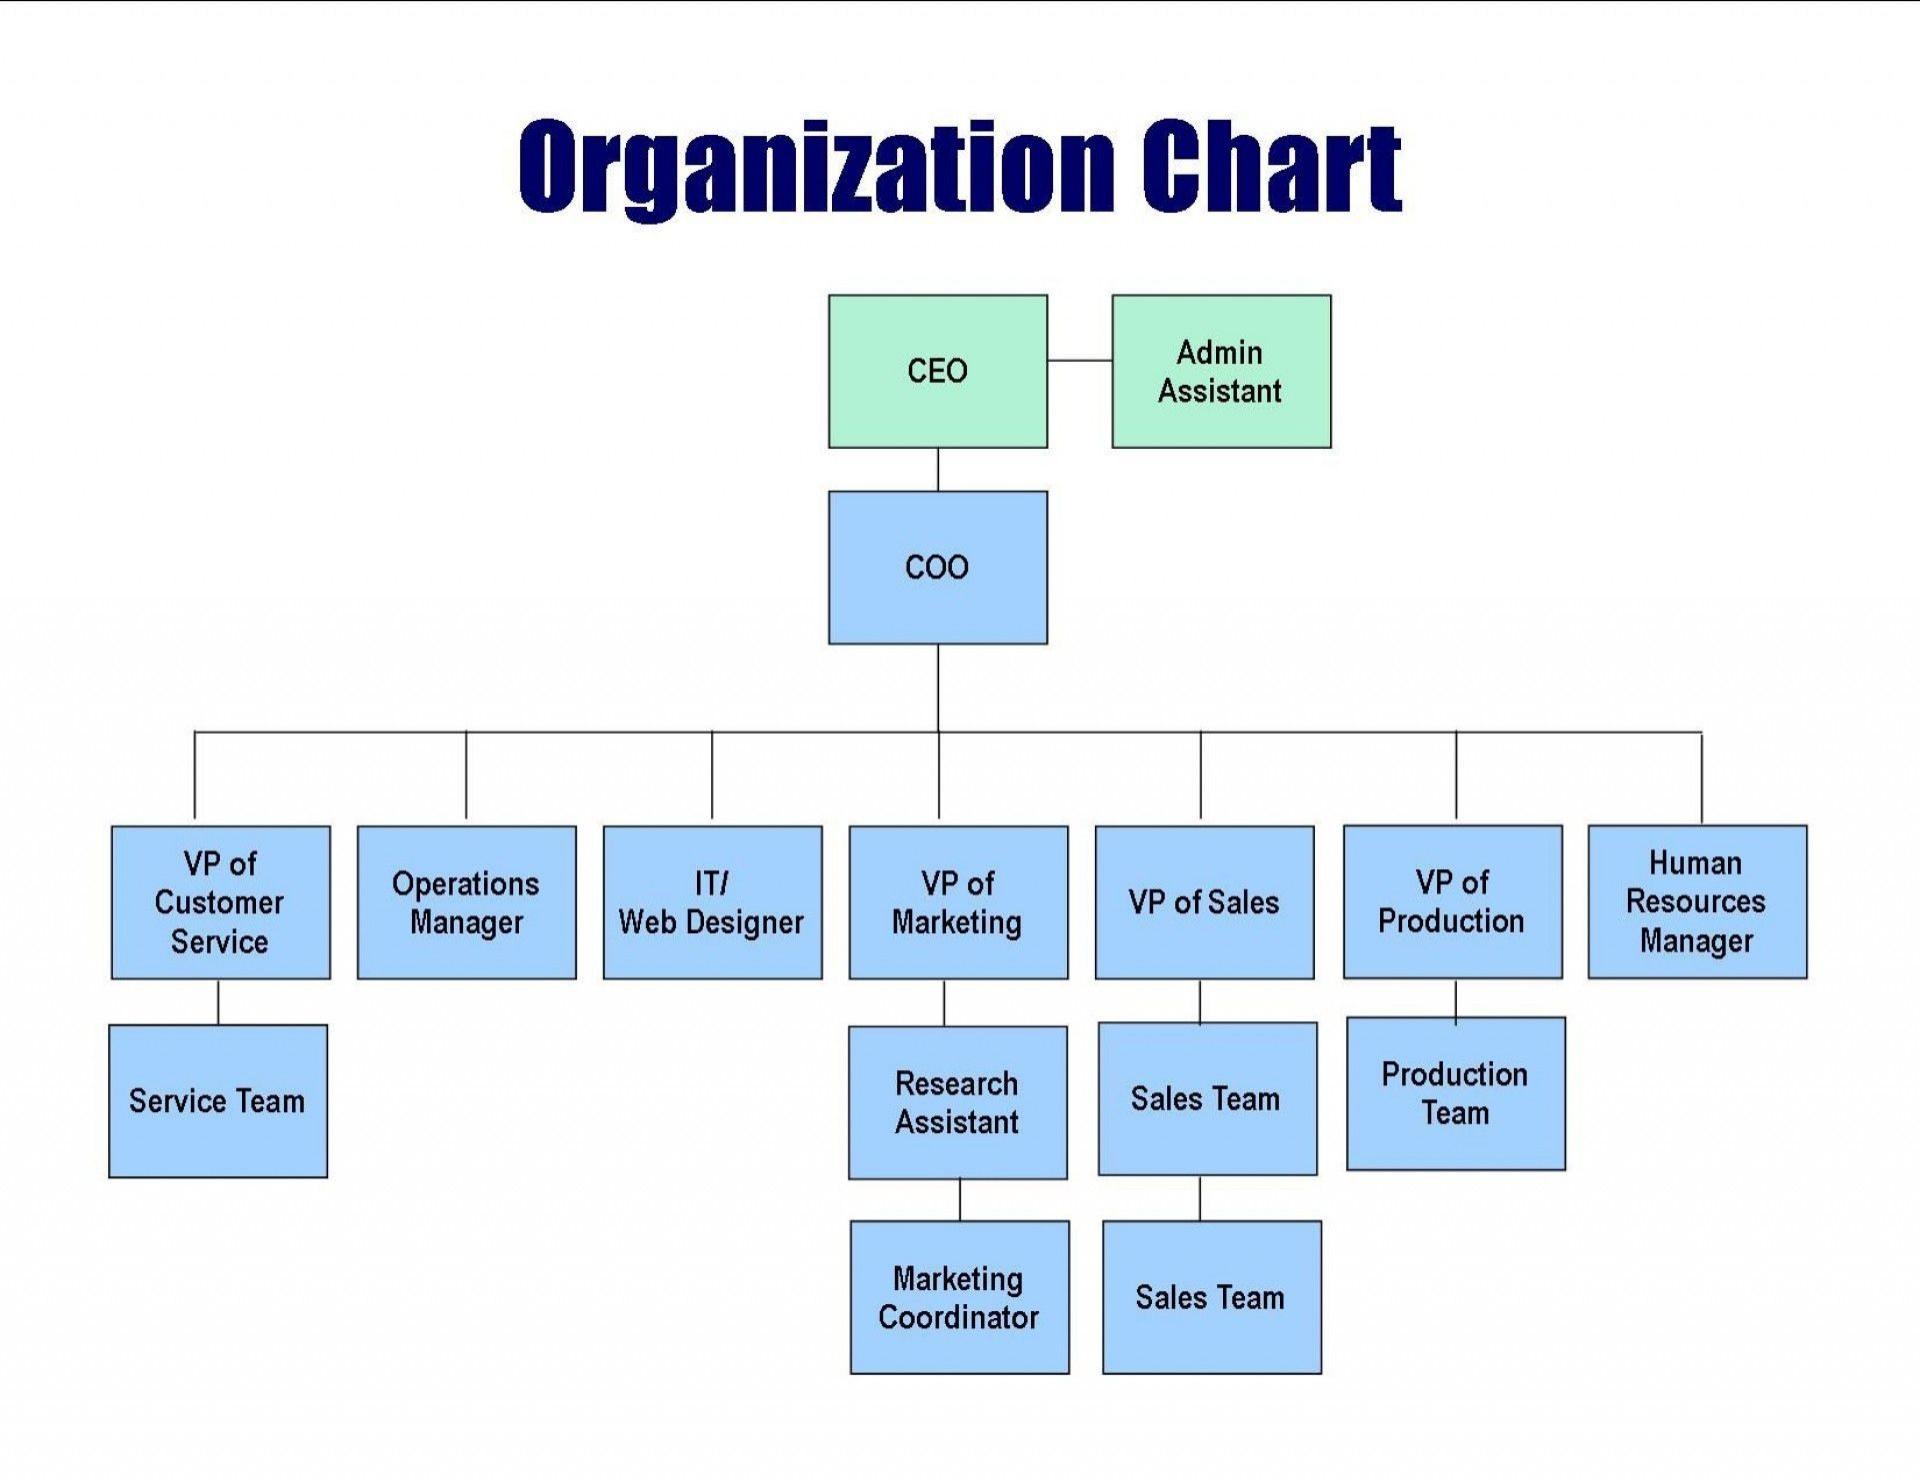 004 Rare Organizational Chart Template Word Concept  2013 2010 20071920